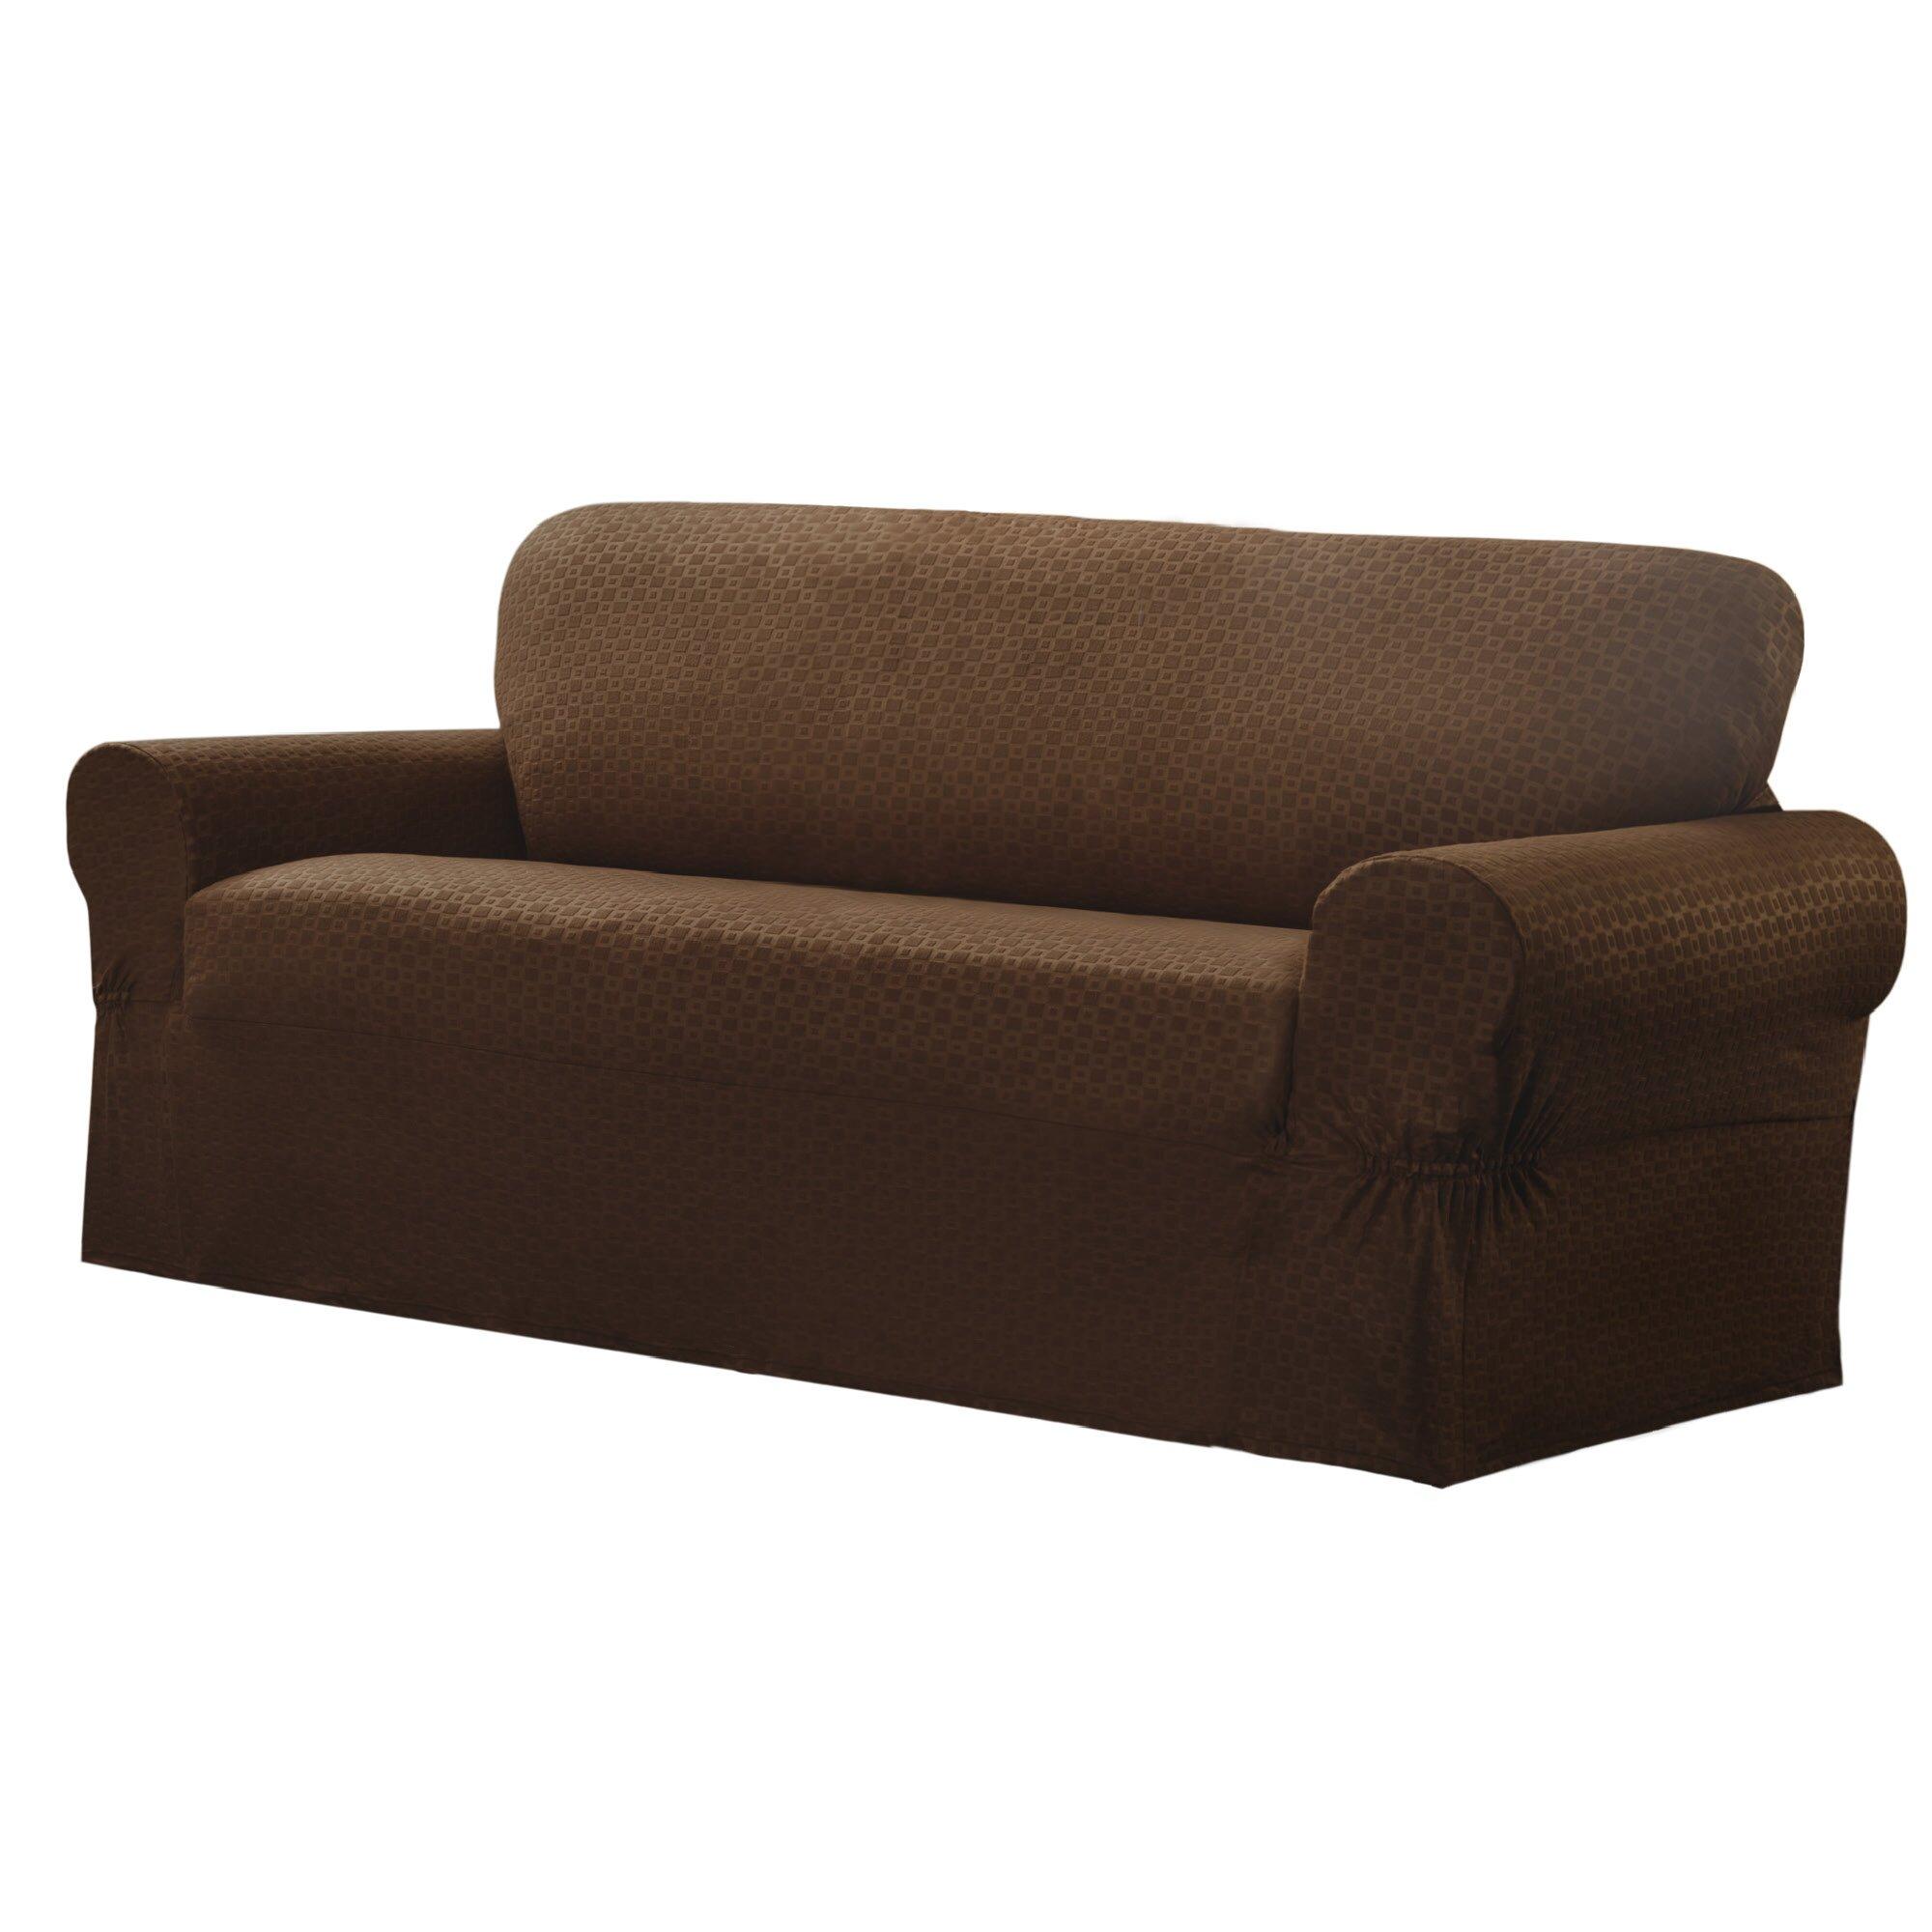 maytex conrad stretch sofa box cushion slipcover reviews. Black Bedroom Furniture Sets. Home Design Ideas